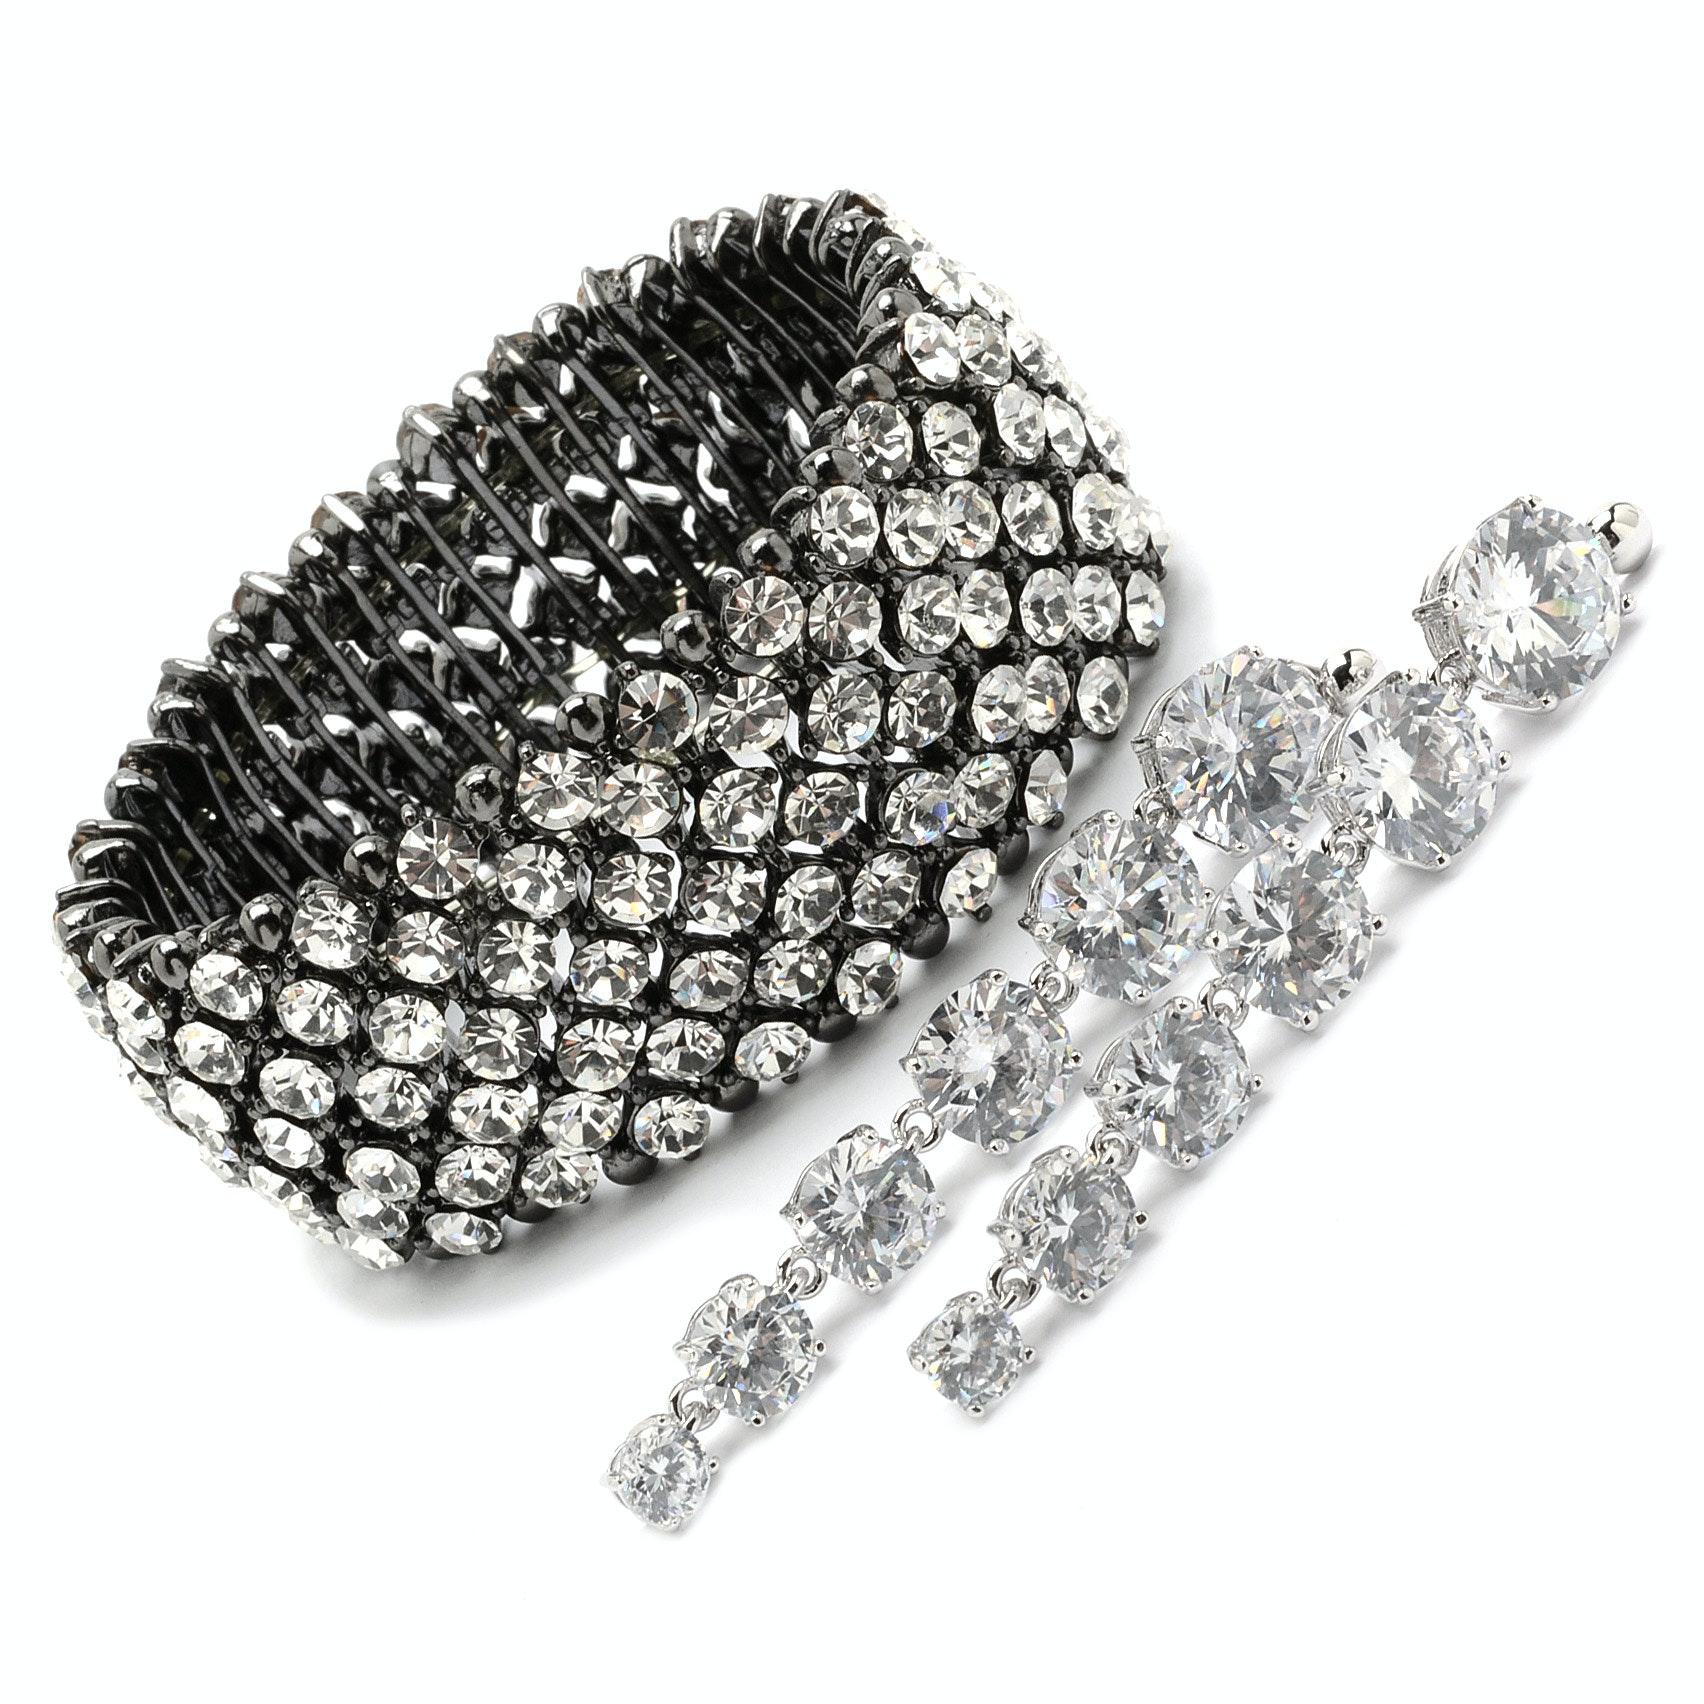 Park Lane Crystal Encrusted Stretch Bracelet and Crystal Drop Pierced Earrings